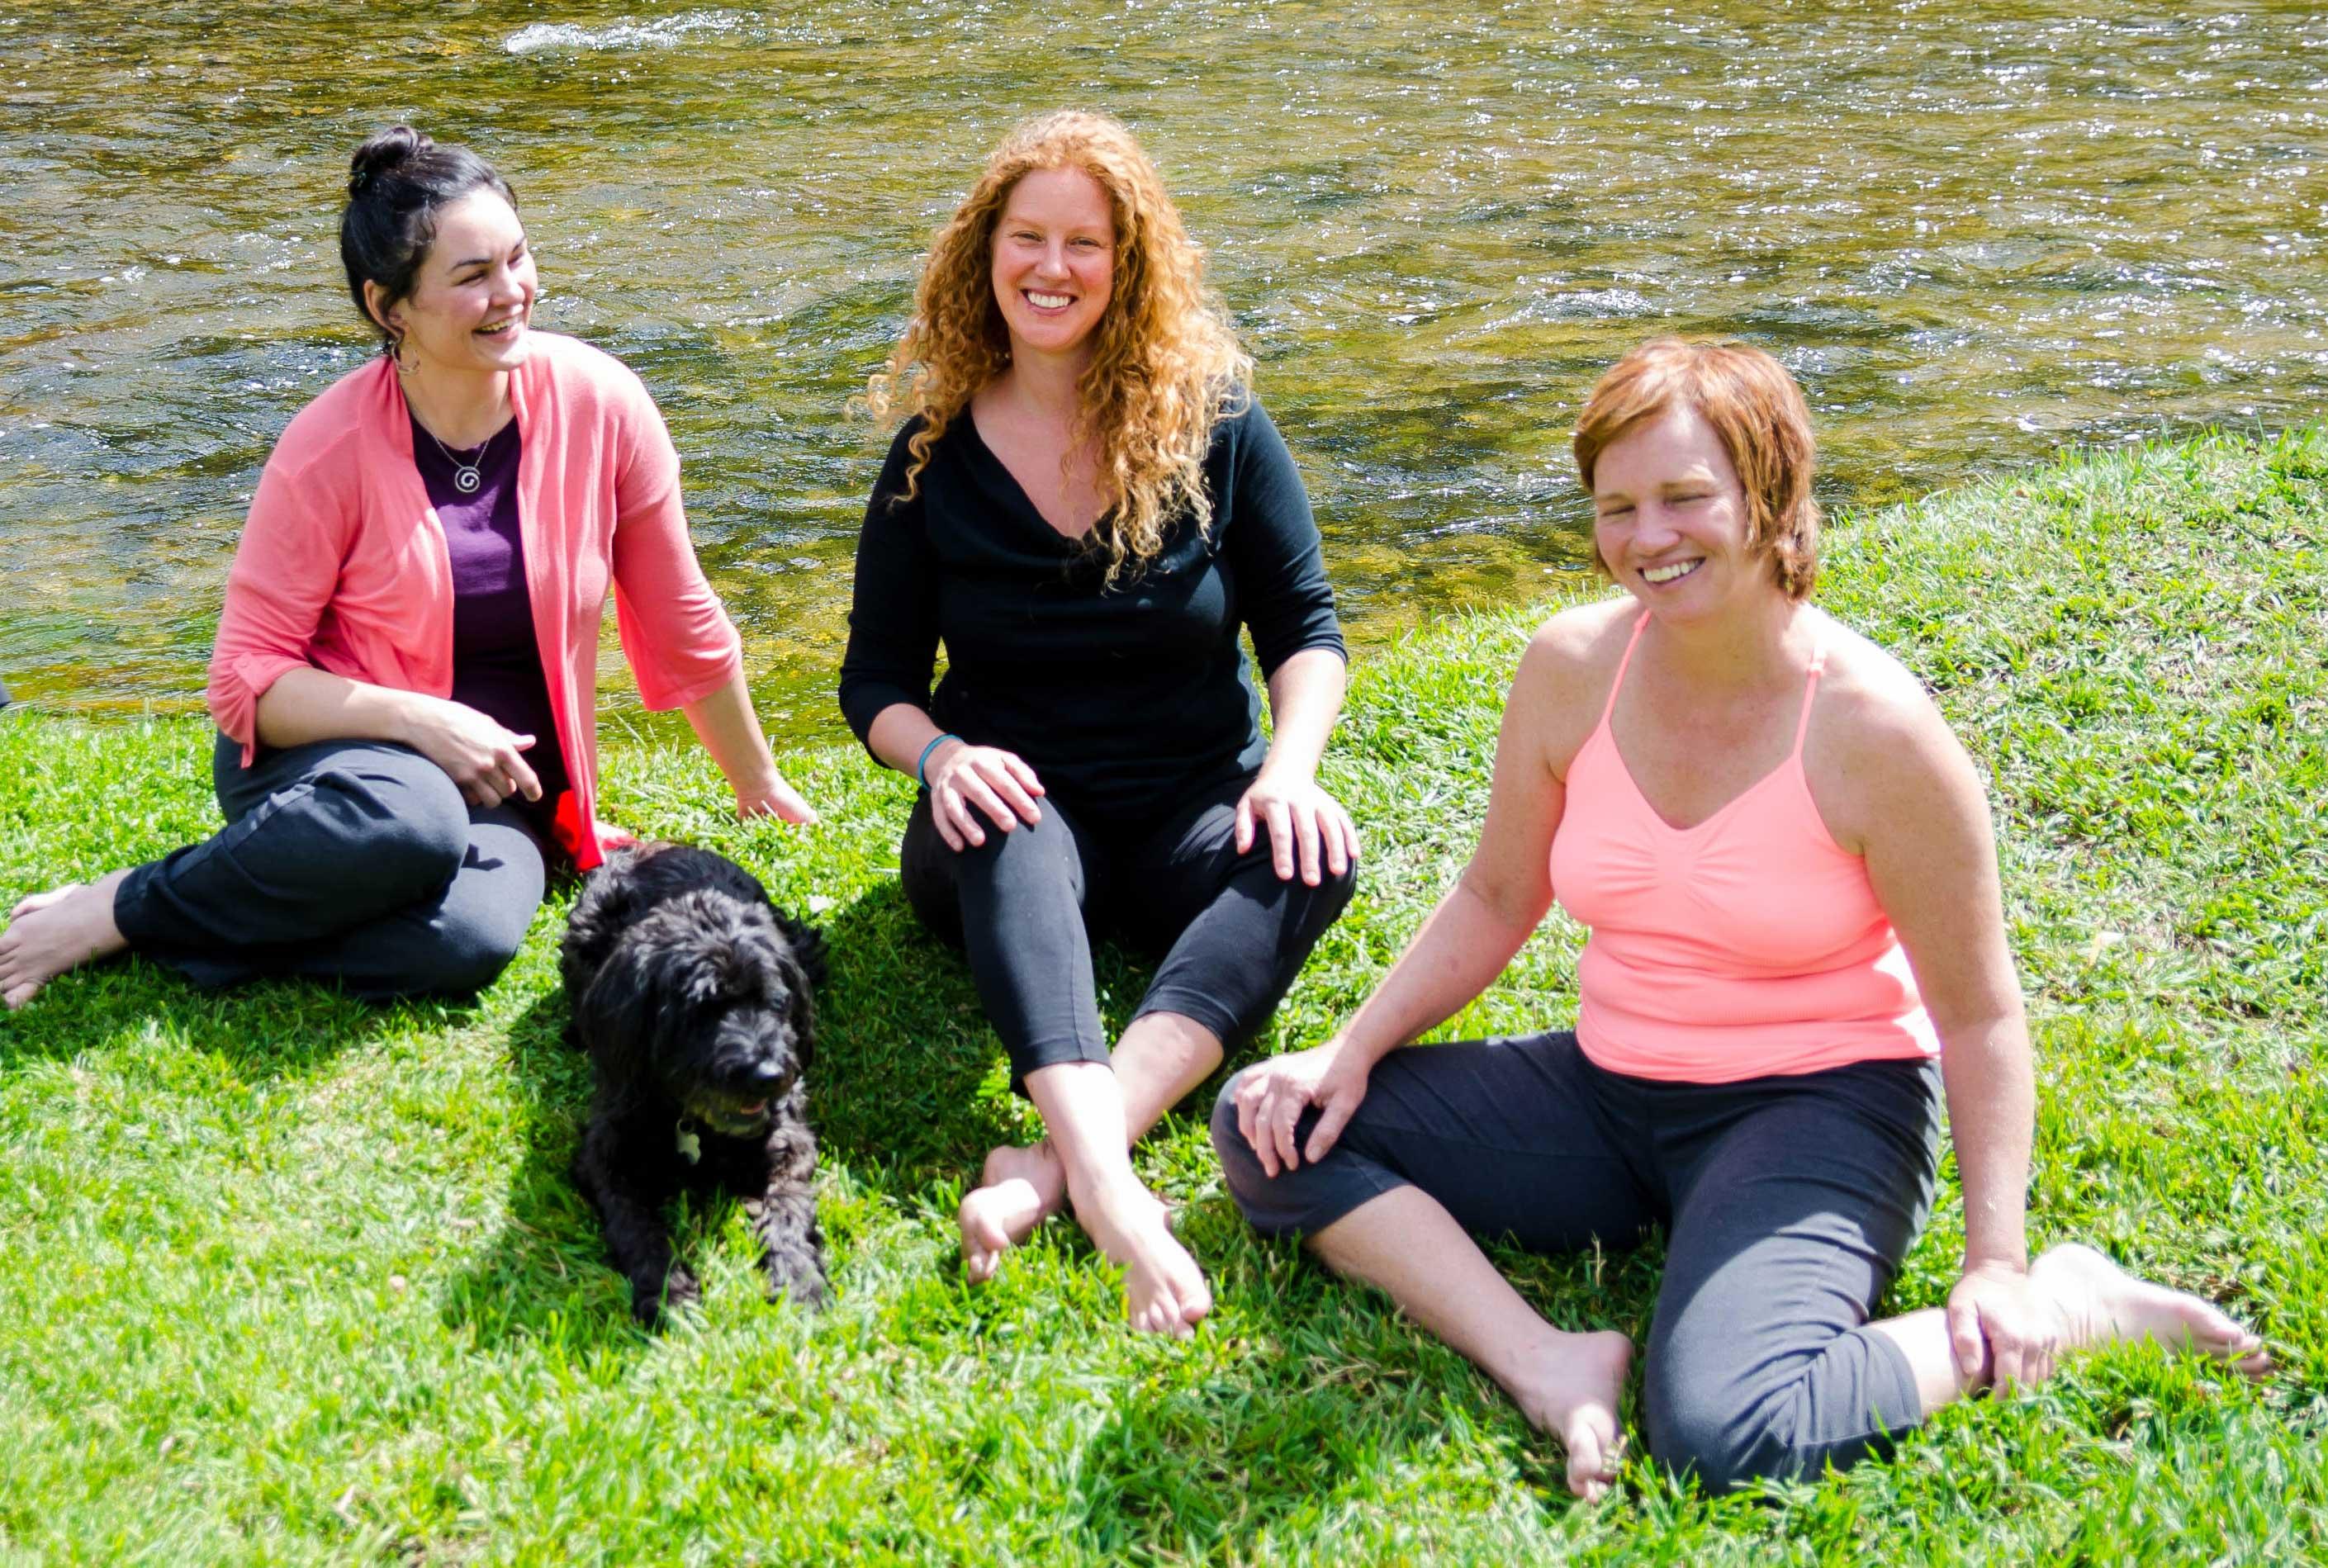 Jackson Hole Mobile Massage therapists